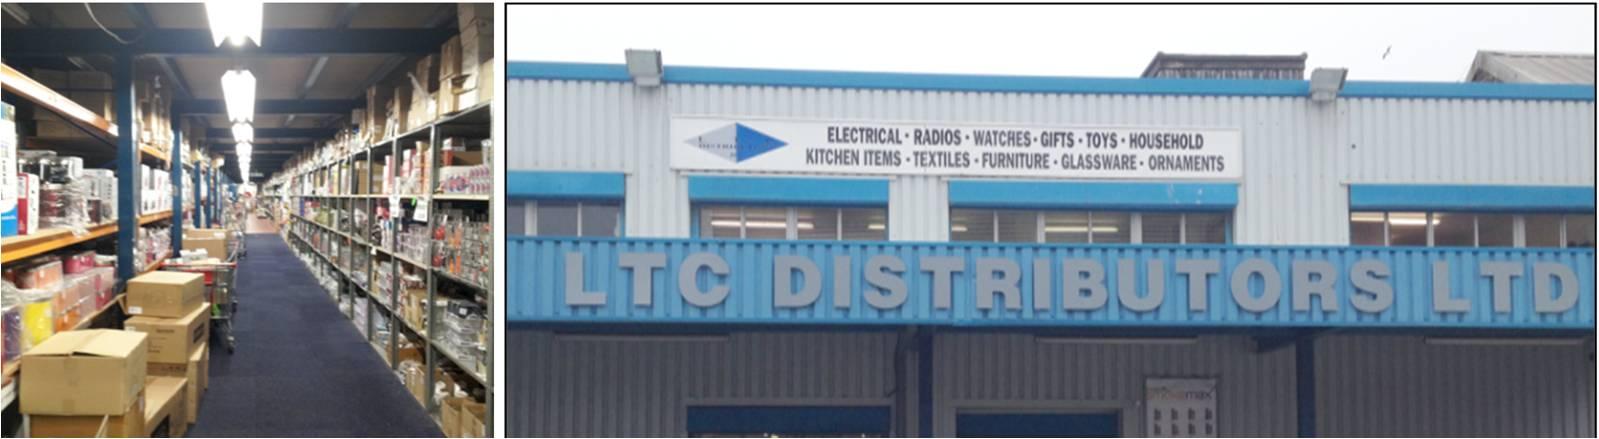 LED Distribution | Projects | Wholesales (LTC) | Glasgow, Scotland